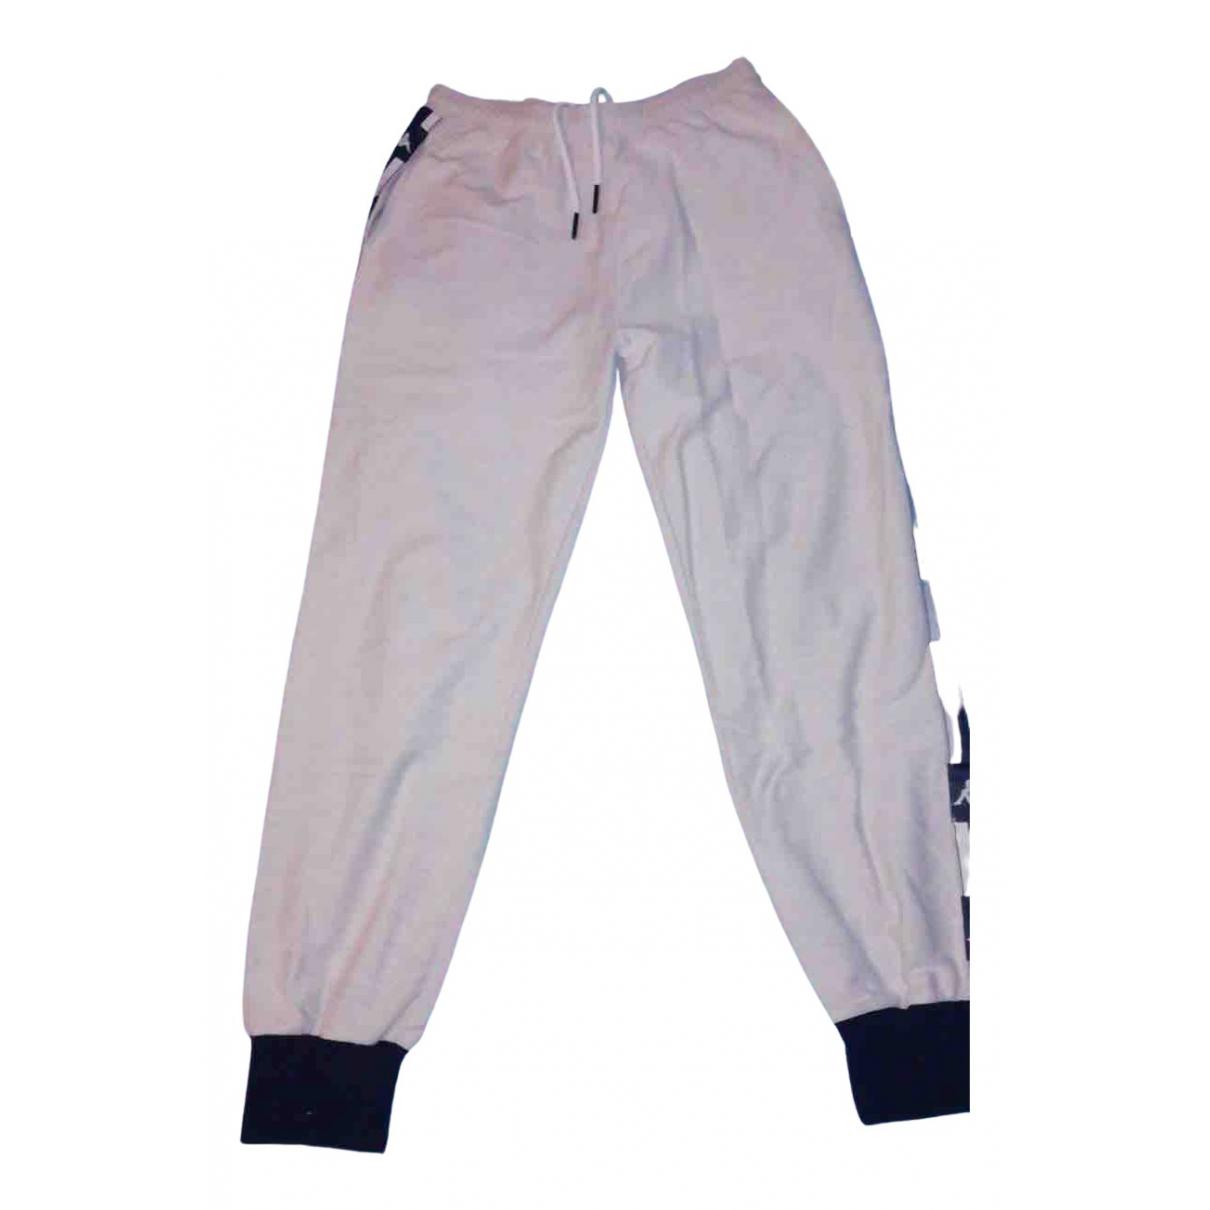 Kappa N Grey Cotton Trousers for Men M International